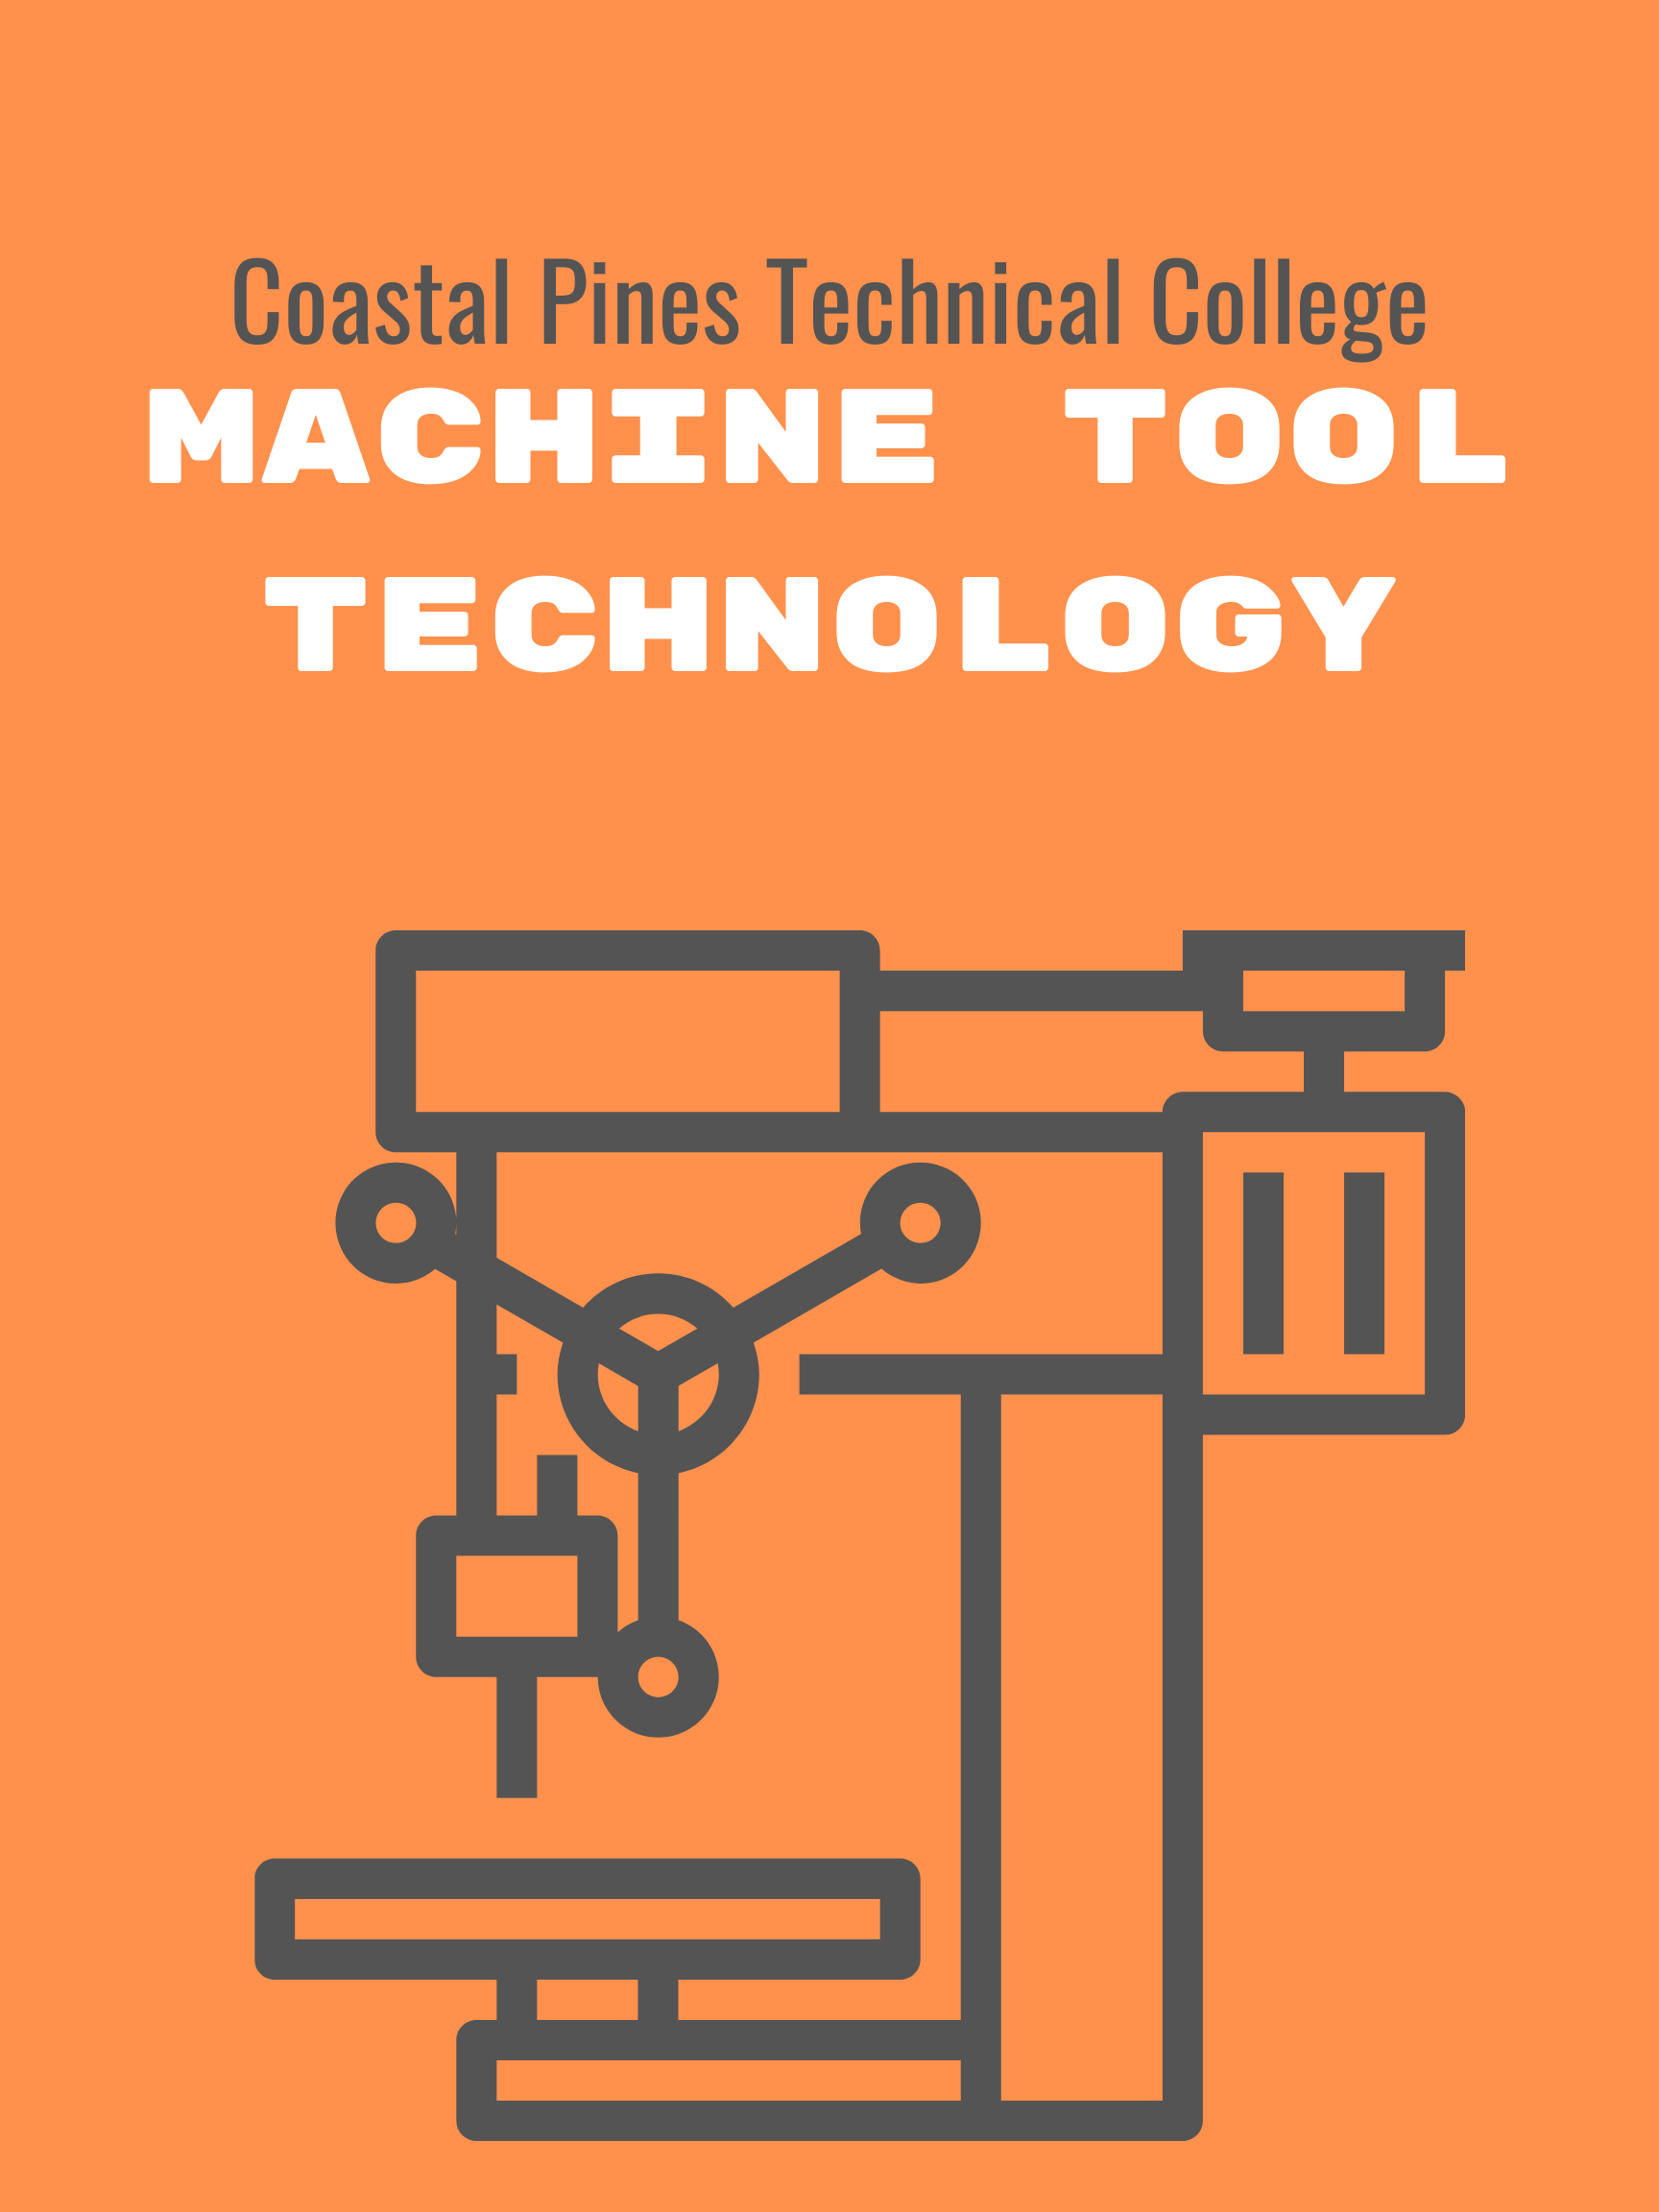 Coastal Pines Technical College Machine Tool Technology